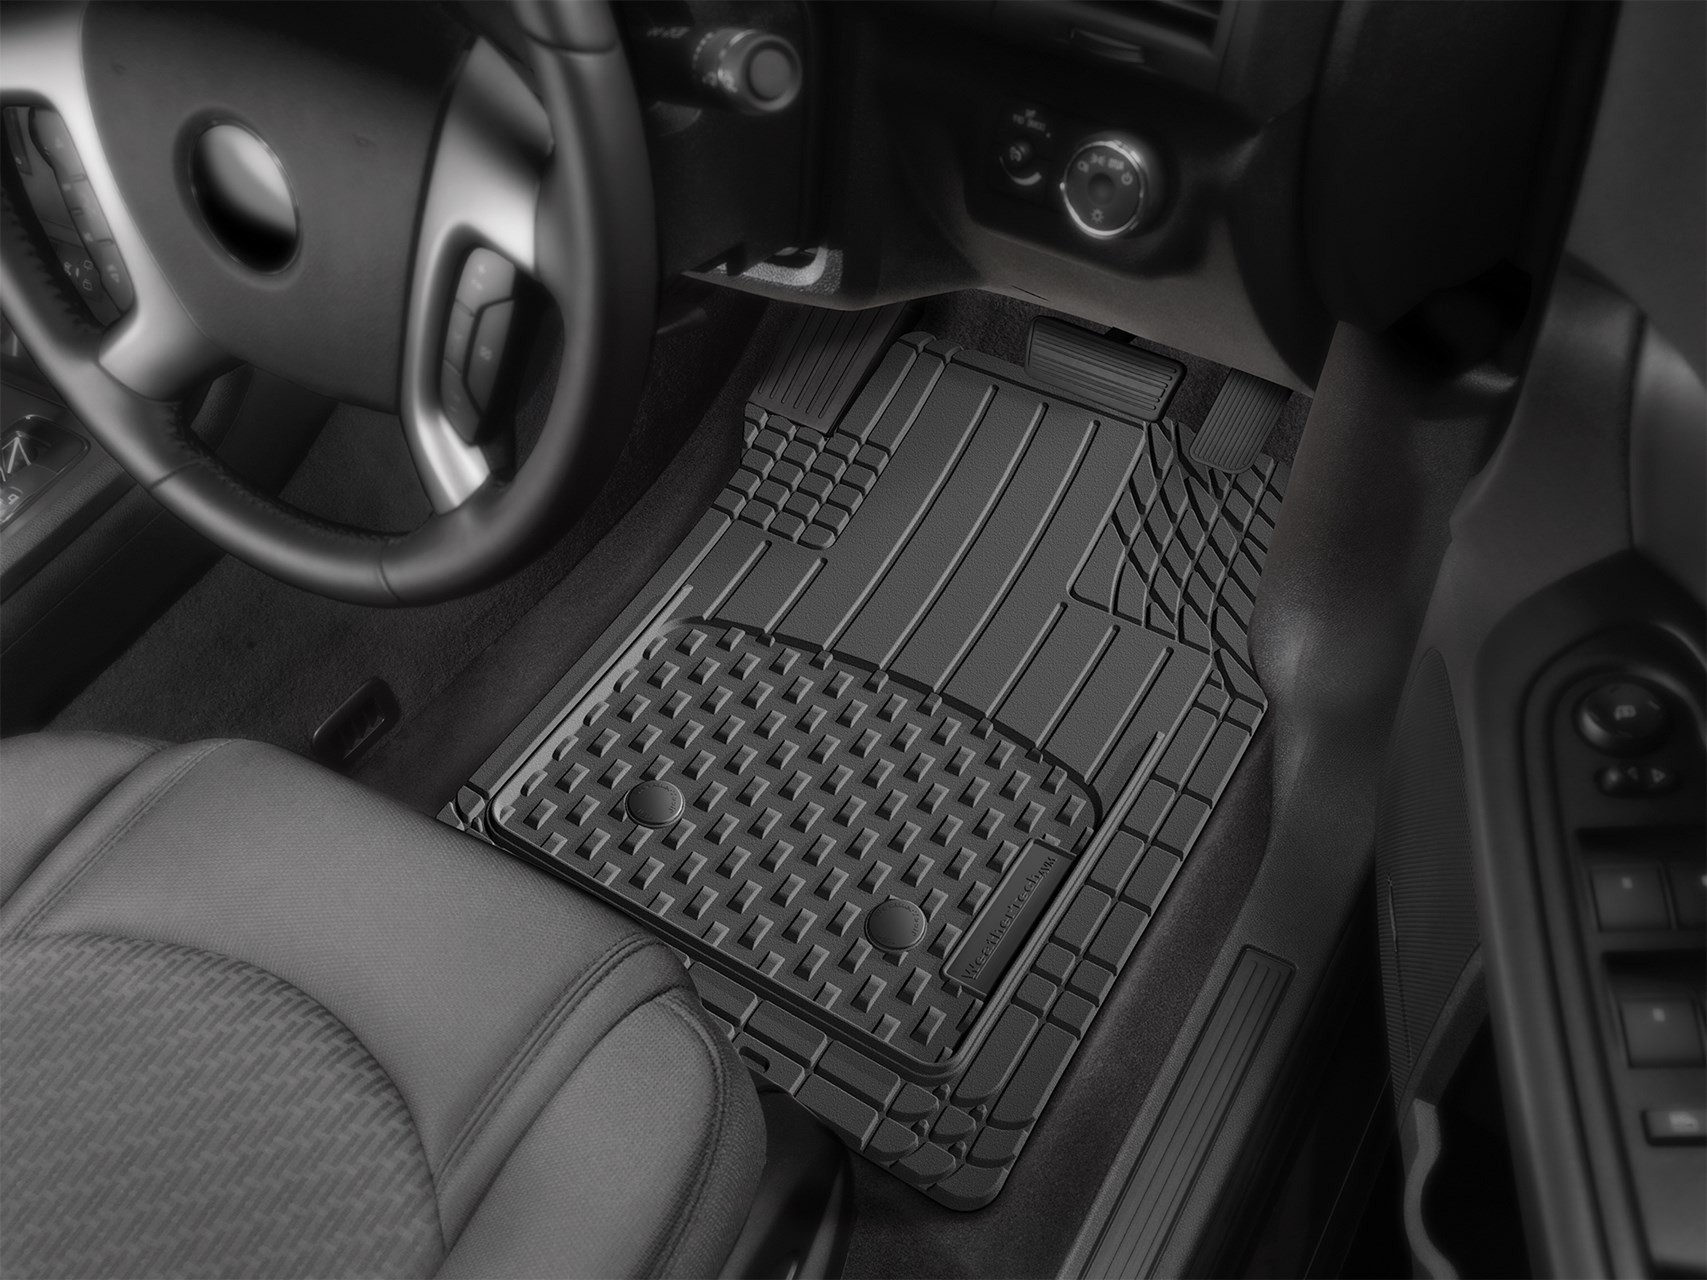 Weathertech floor mats europe - Semi Universal Trim To Fit Flexible Floor Mats For All Vehicles Weathertech Co Uk